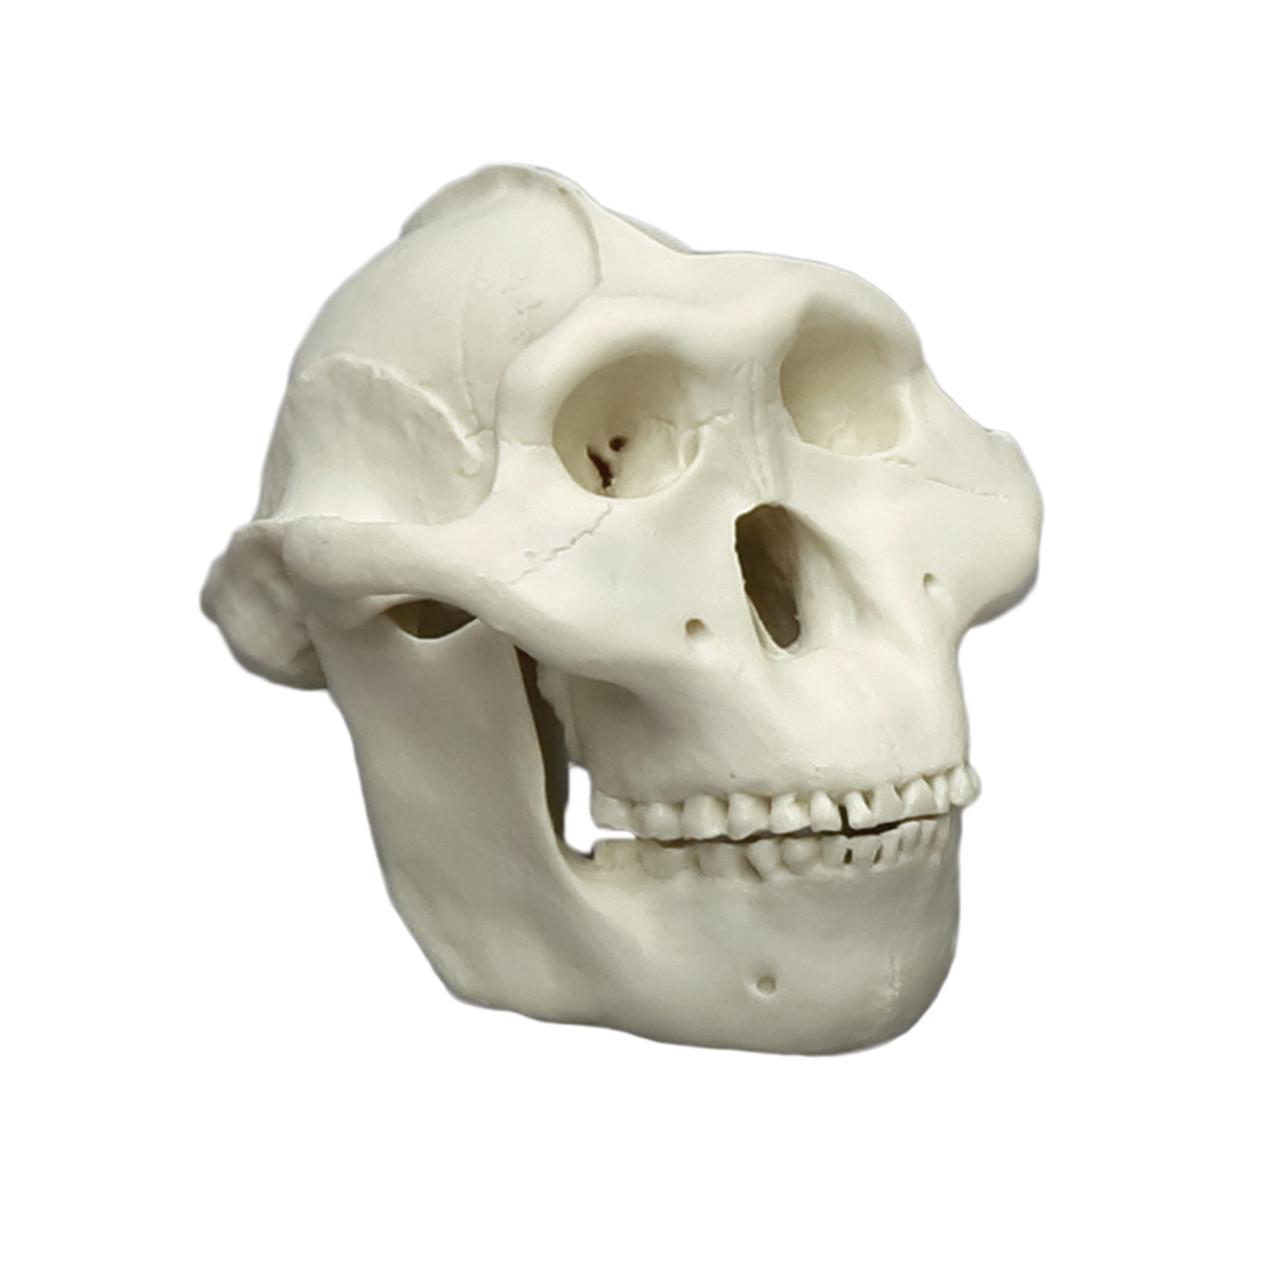 KAM01 - Australopithecus boisei, half scale